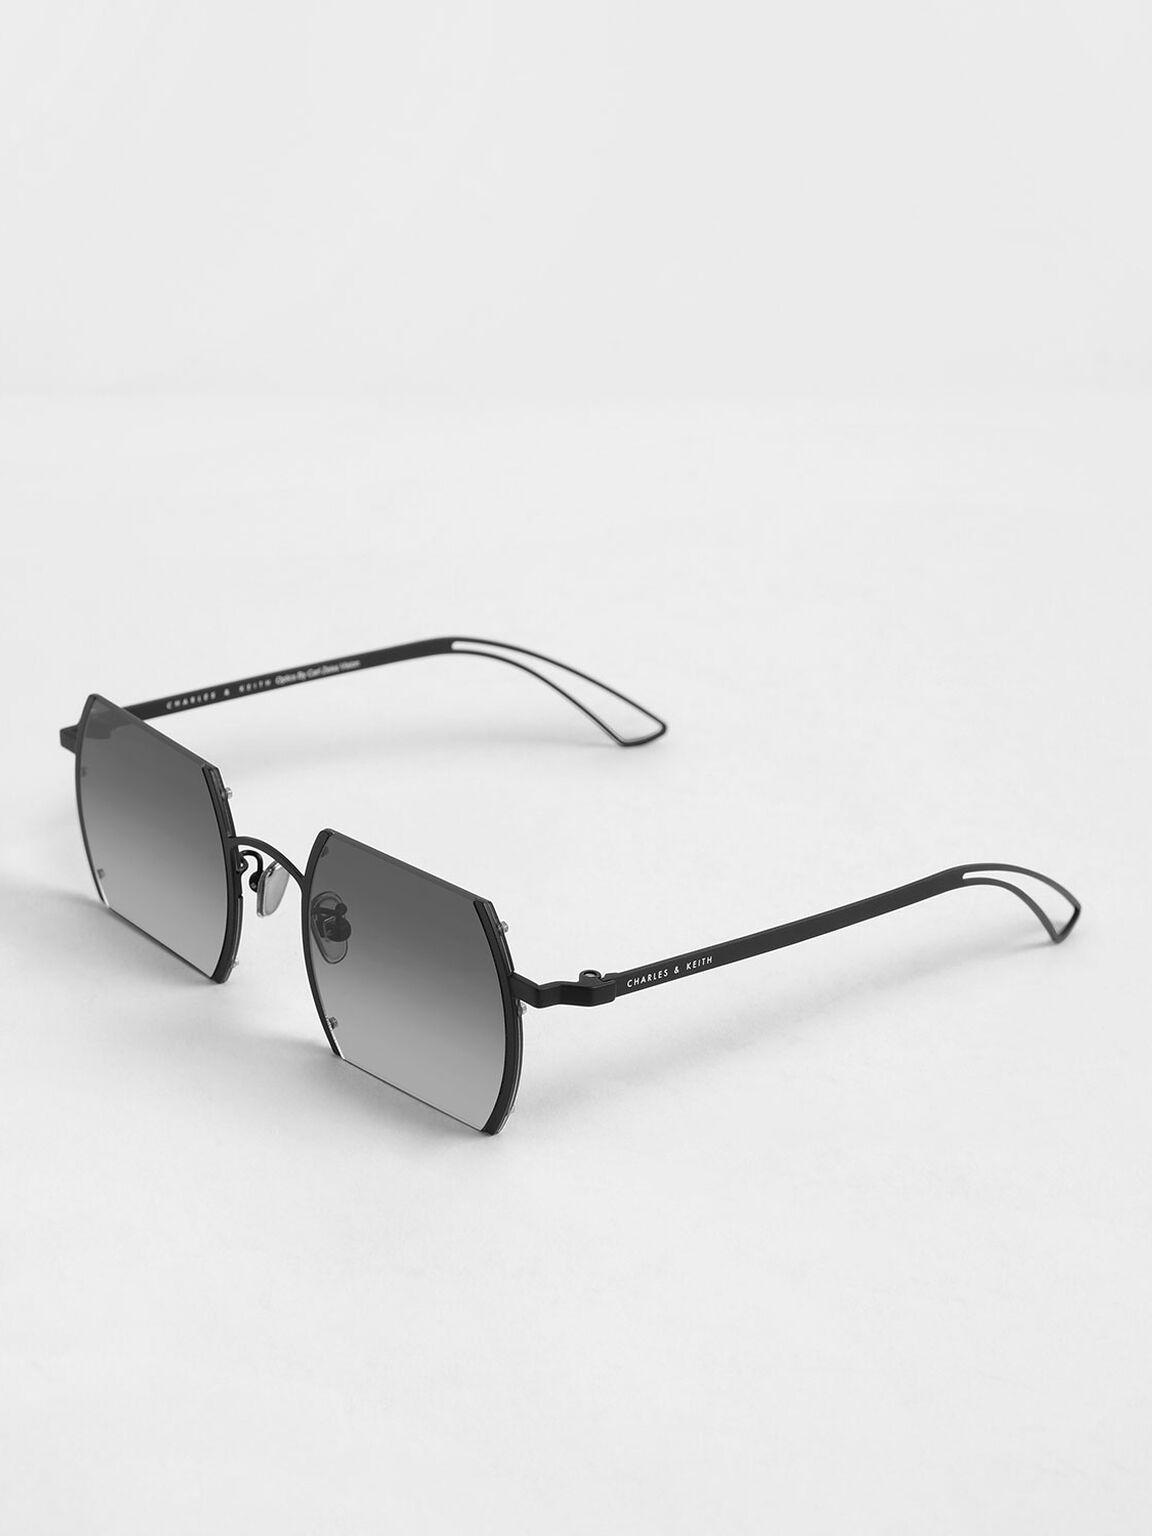 Cut-Off Frame Round Sunglasses, Black, hi-res